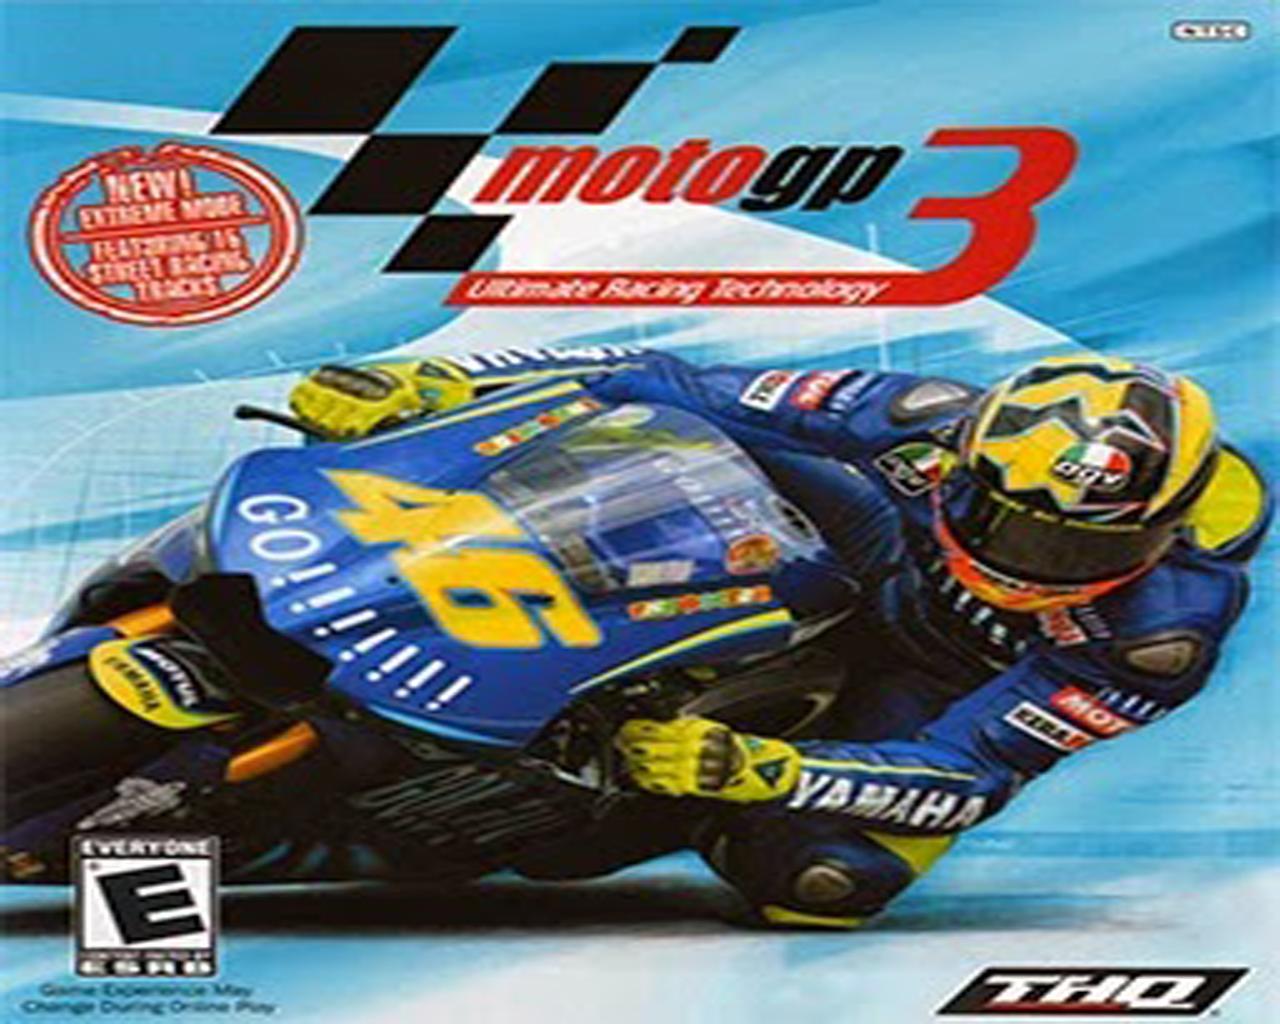 Addictive game: motogp 2 game free download | ajakai ict.